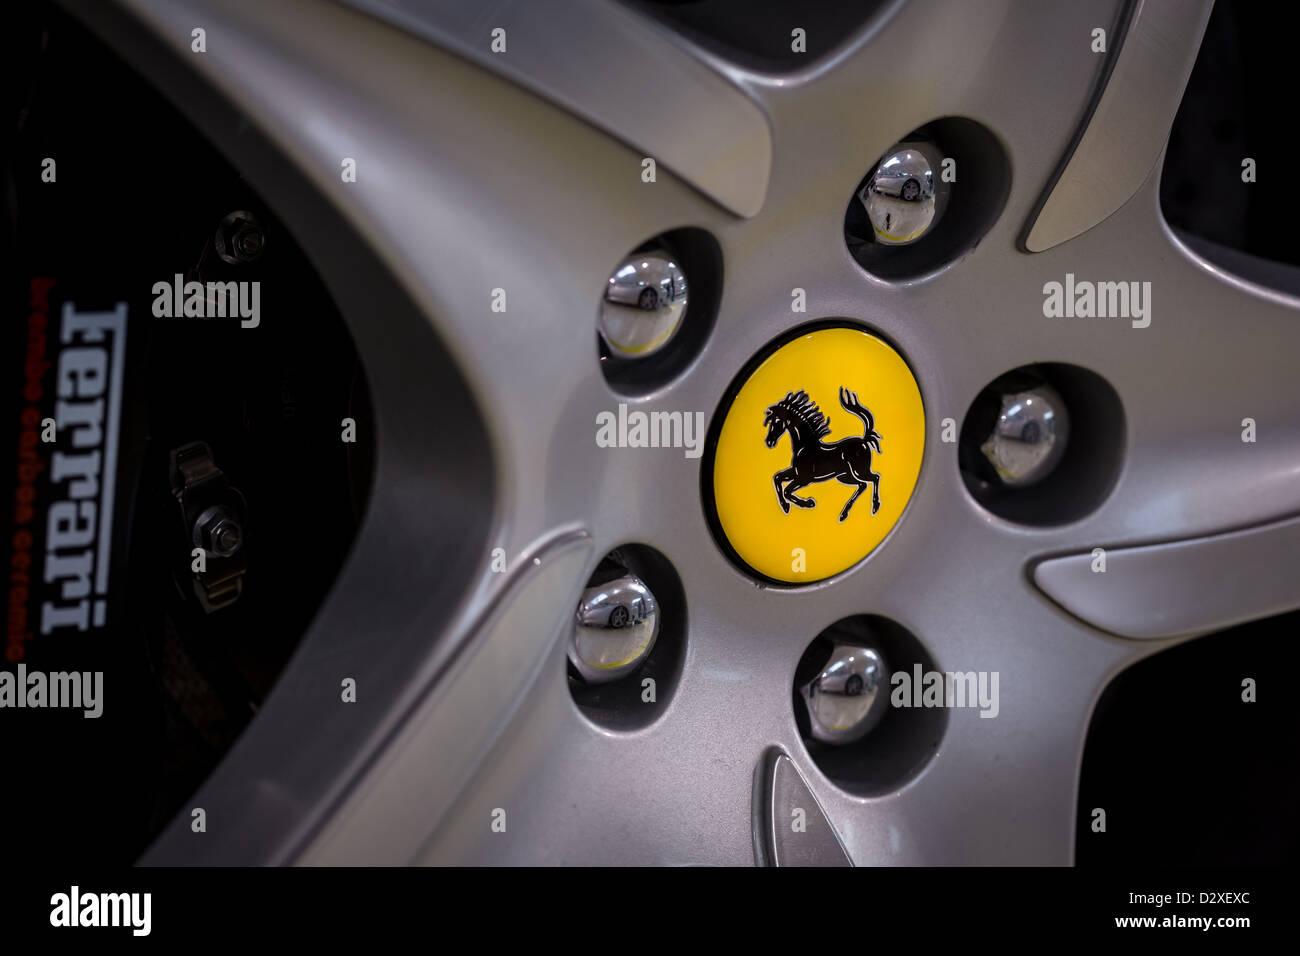 Ferrari logo on silver wheel rim, Moranello, Italy, Europe Stock Photo